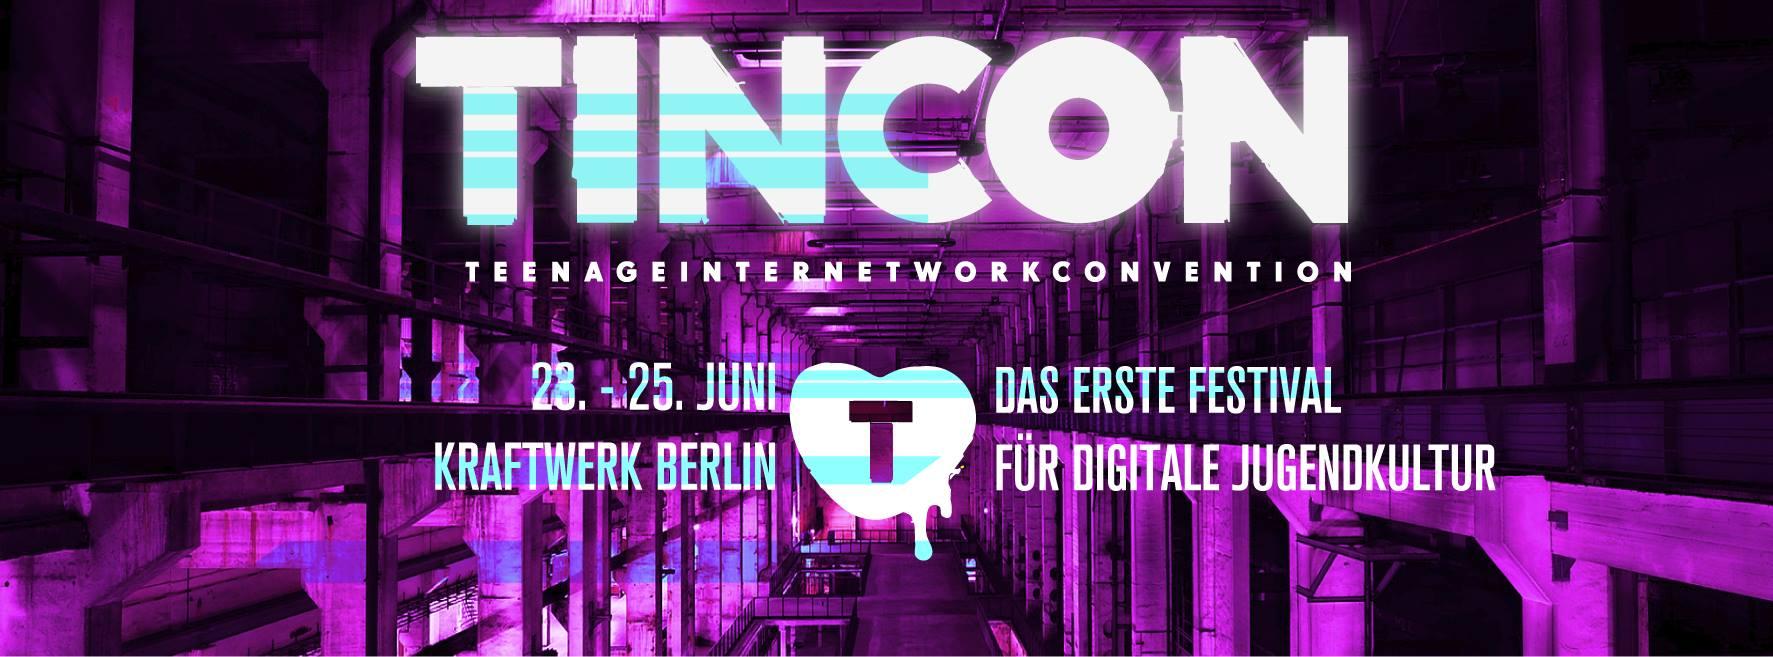 TINCON – teenageinternetwork convention 2017